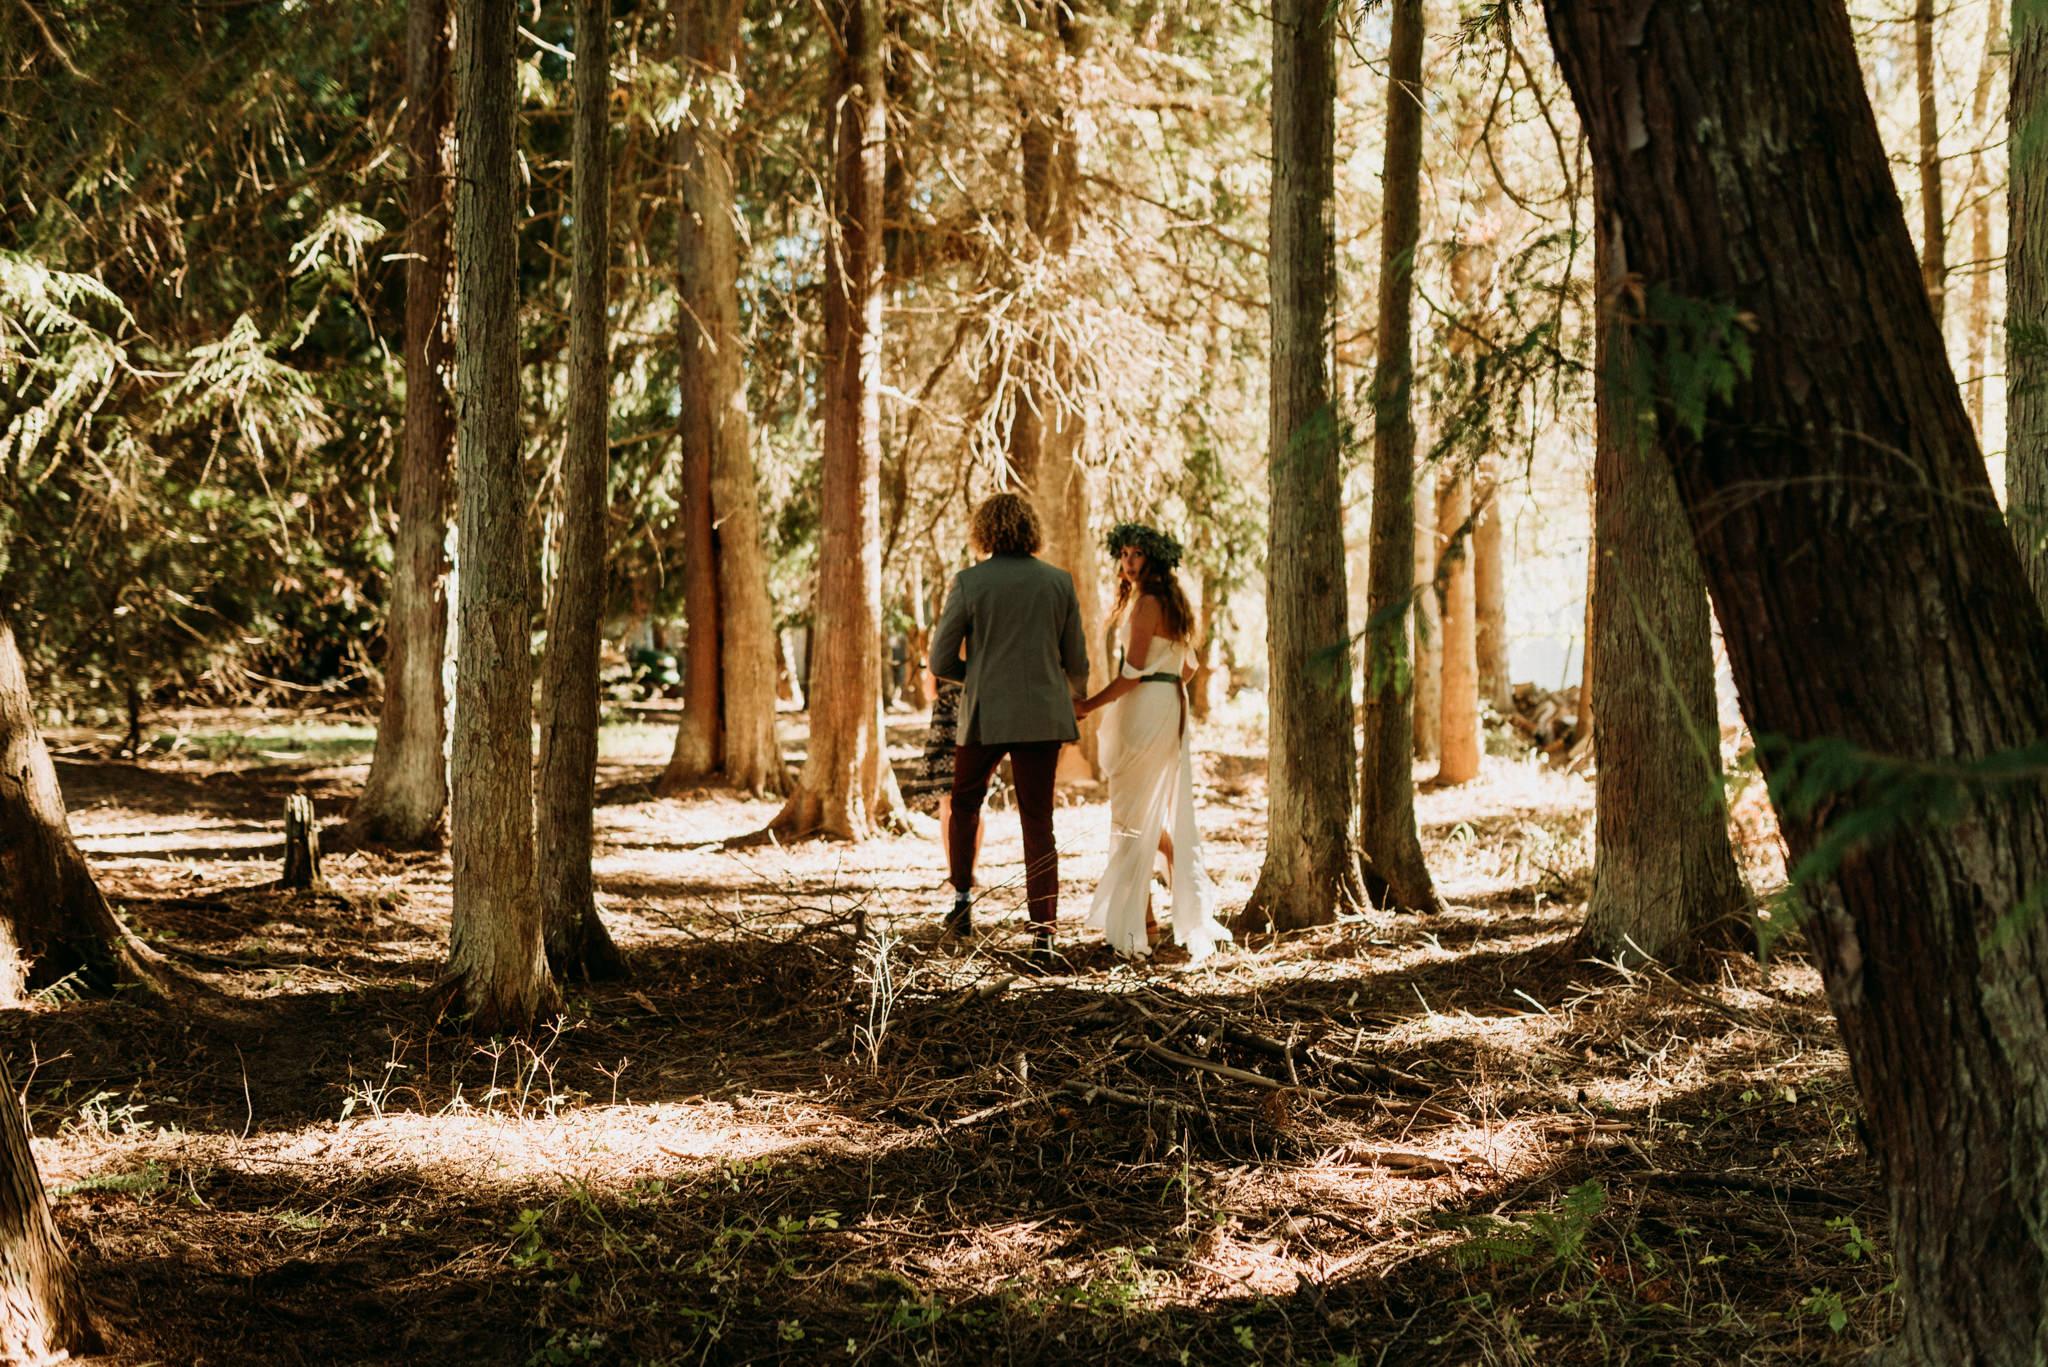 magical-bohemian-barnhouse-greenery-port-angeles-washington-forest-seaside-grassy-backyard-wedding-Kerlyn-Van-Gelder-Photography-Washington-Wedding-Photographer